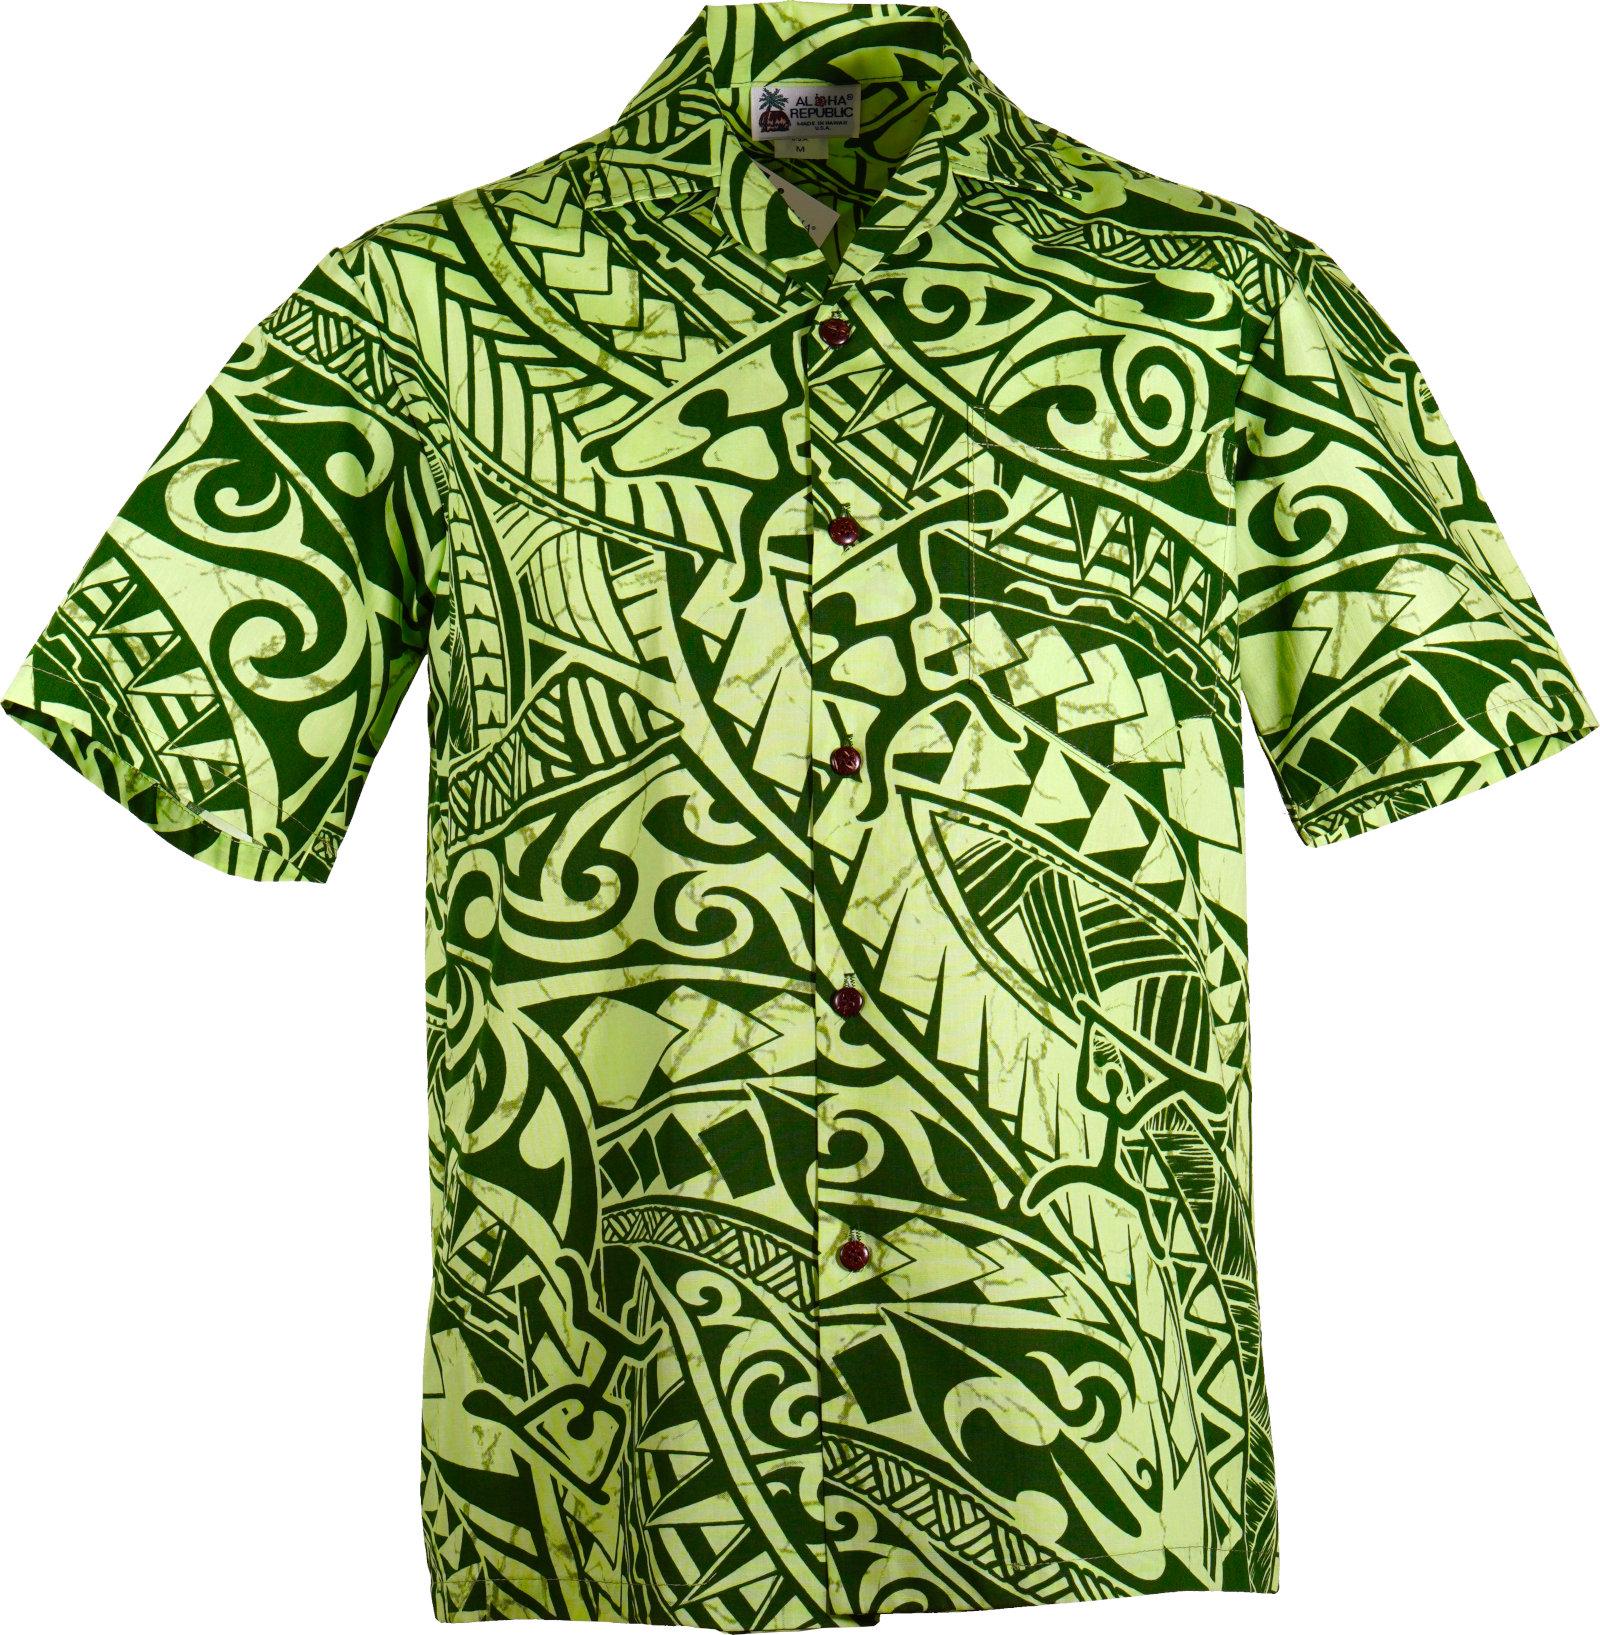 Original Hawaiihemd -Oh!Shark-